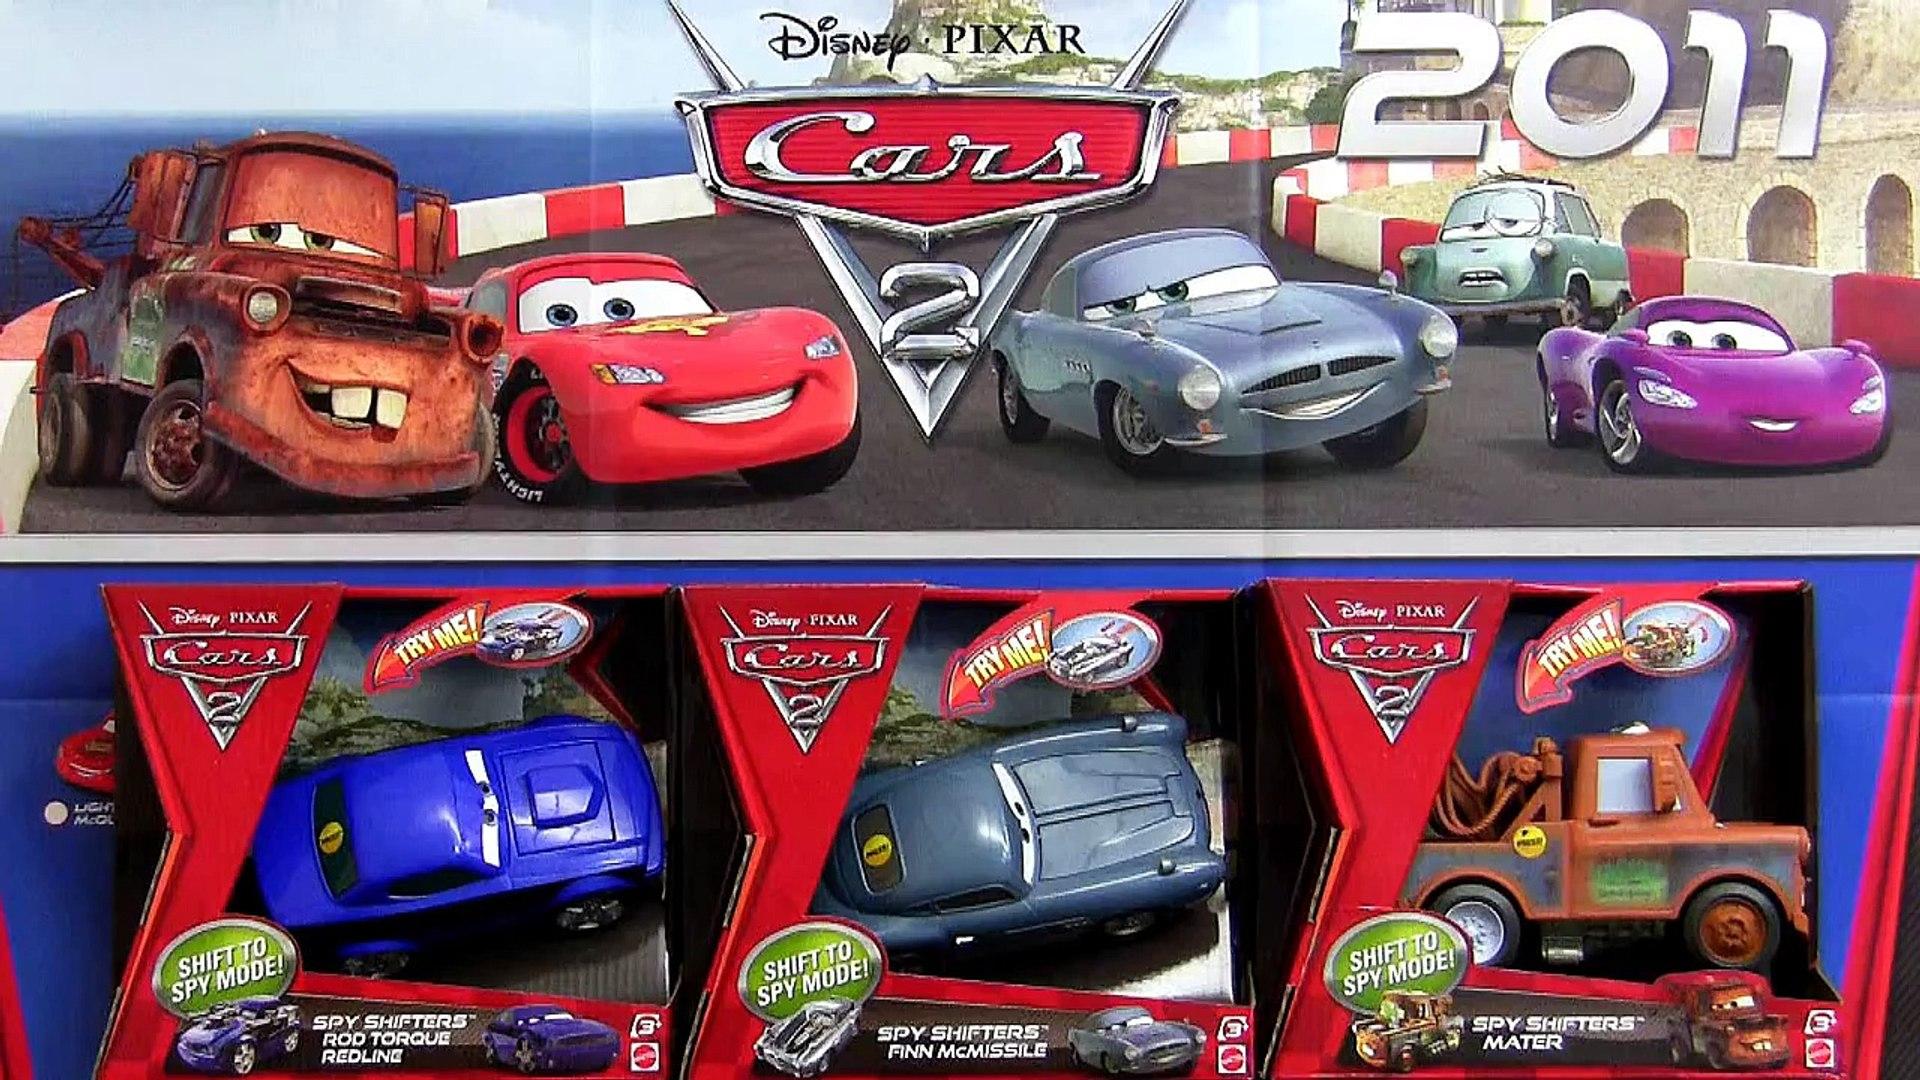 Cars 2 Spy Shifters Transformers Mater Rod Torque Redline Finn